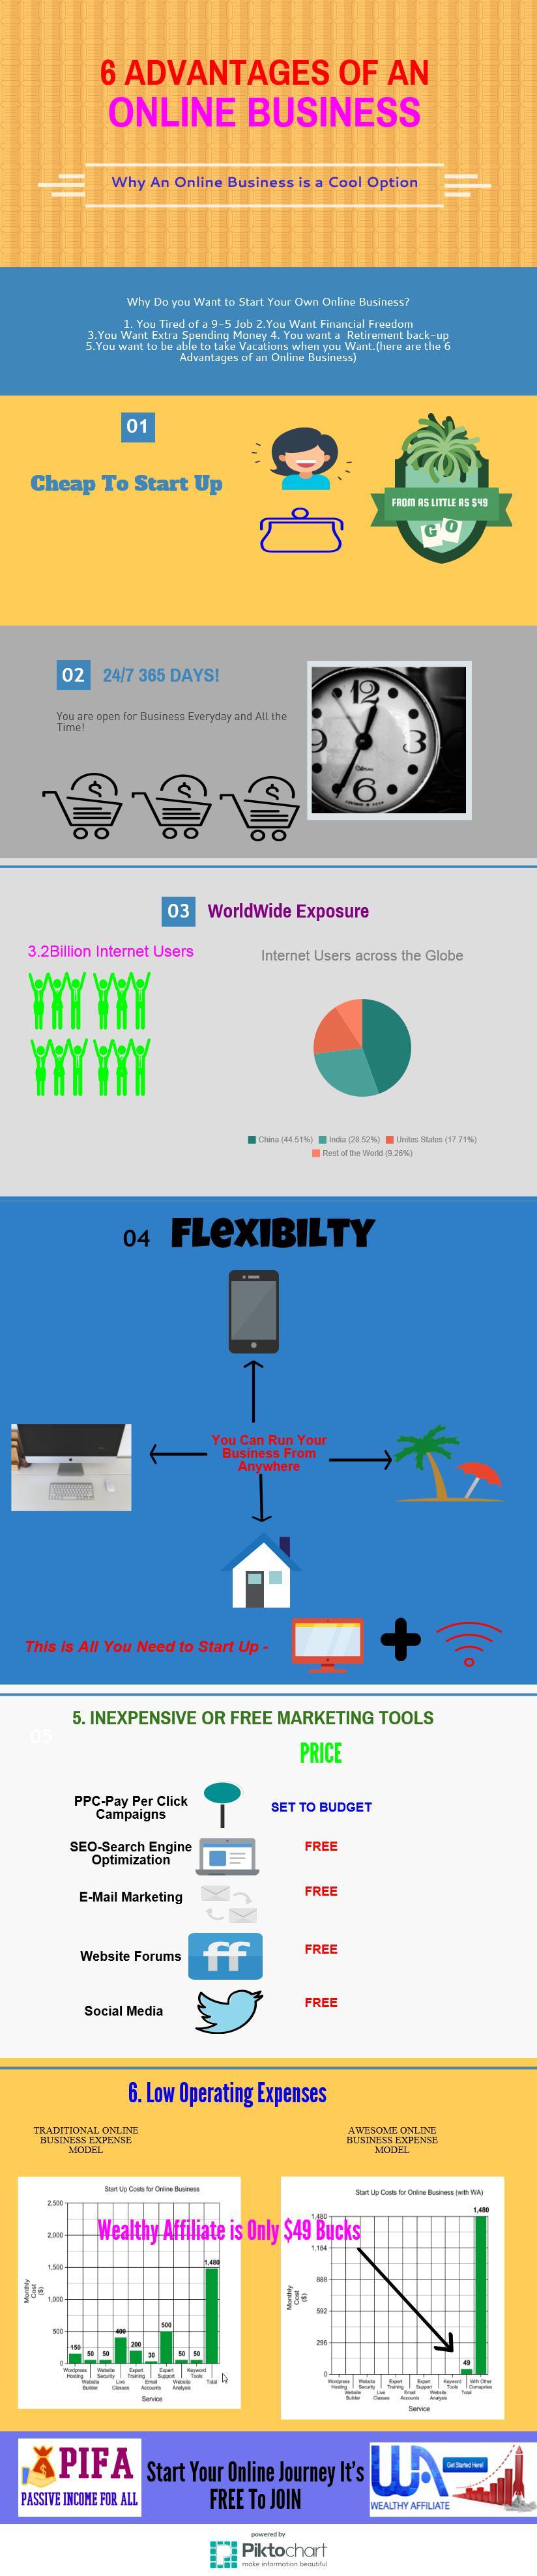 Advantages of an Online Business